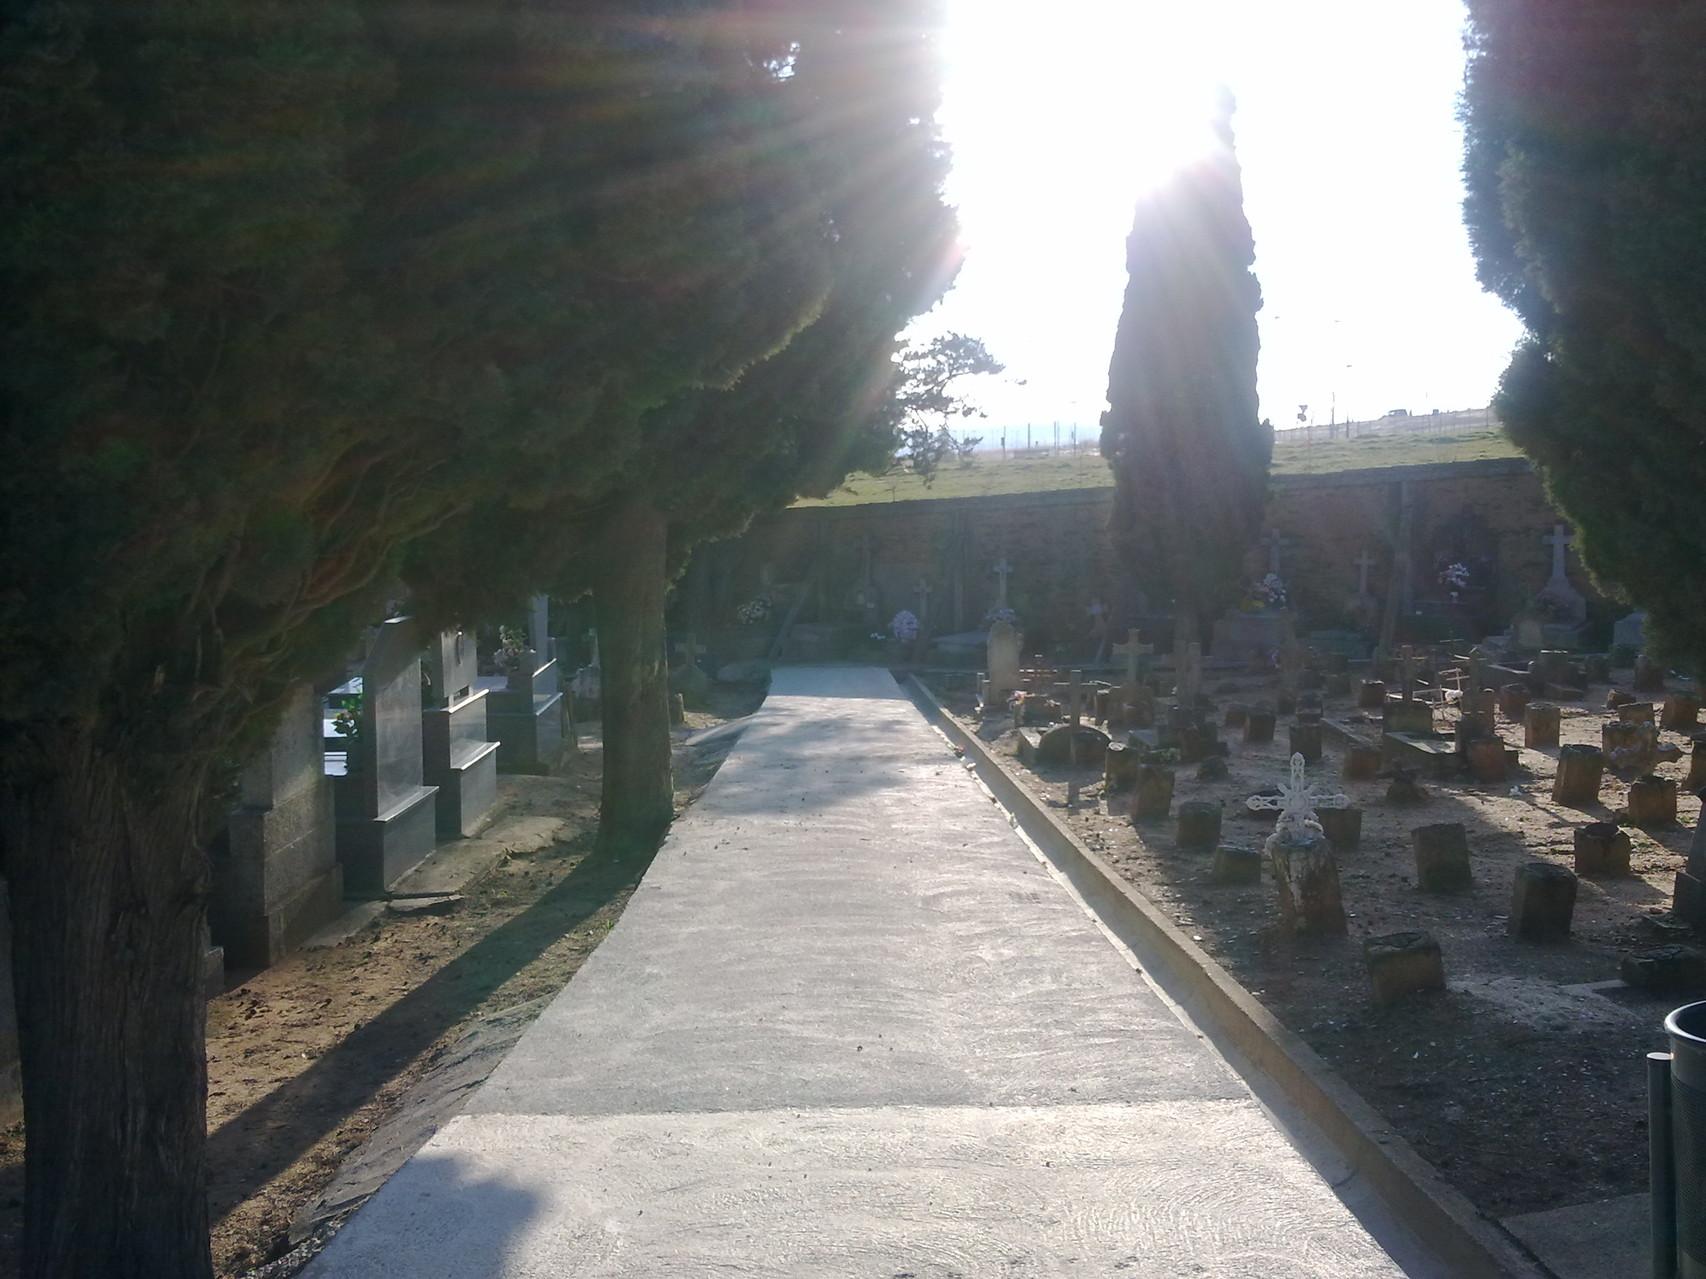 cementerio católico, cementerio civil, Salamanca, foto propia